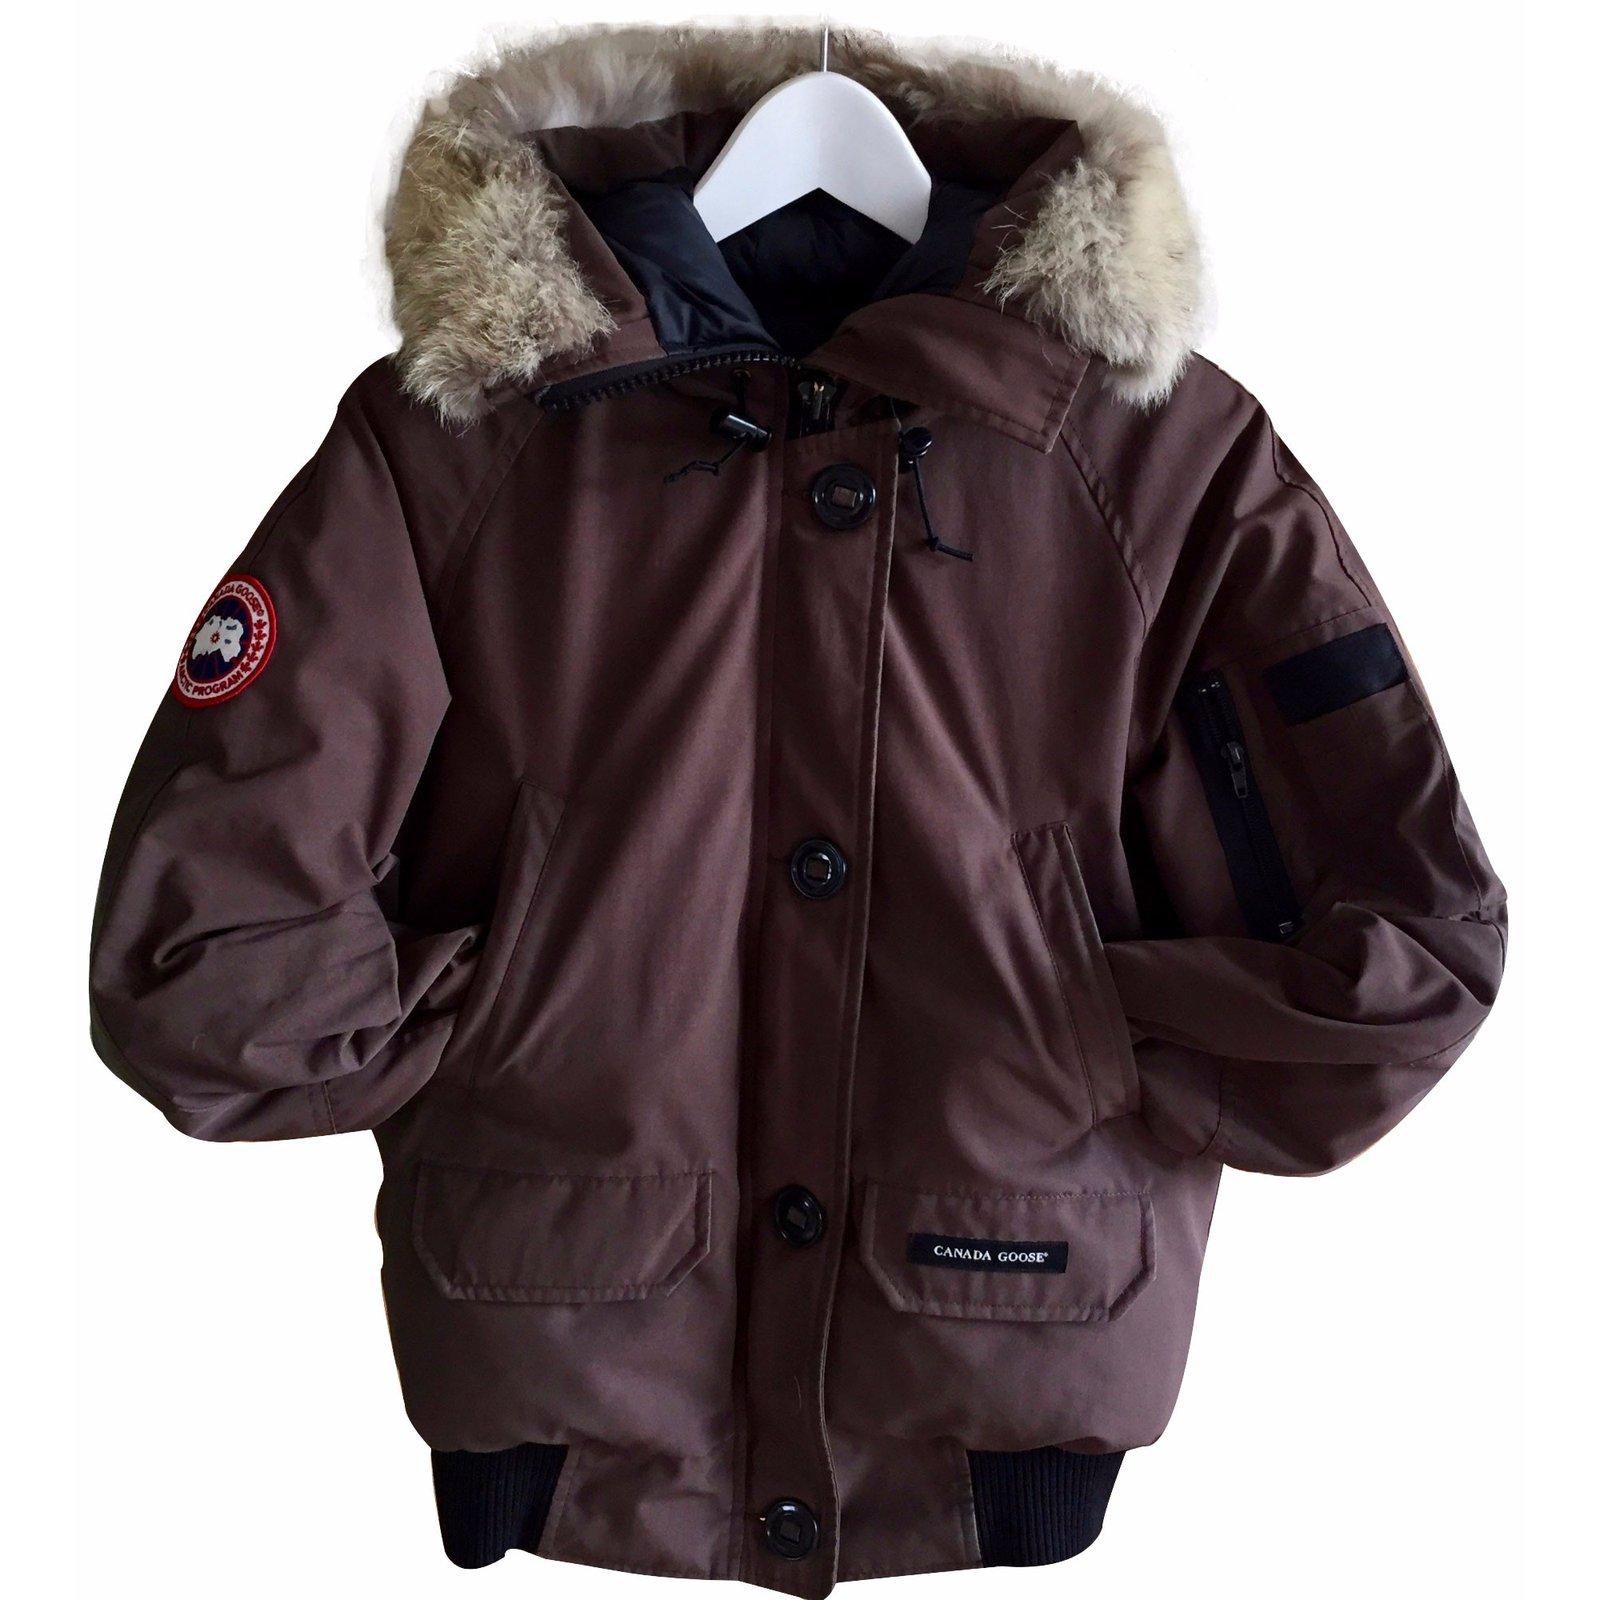 prix manteau canada goose